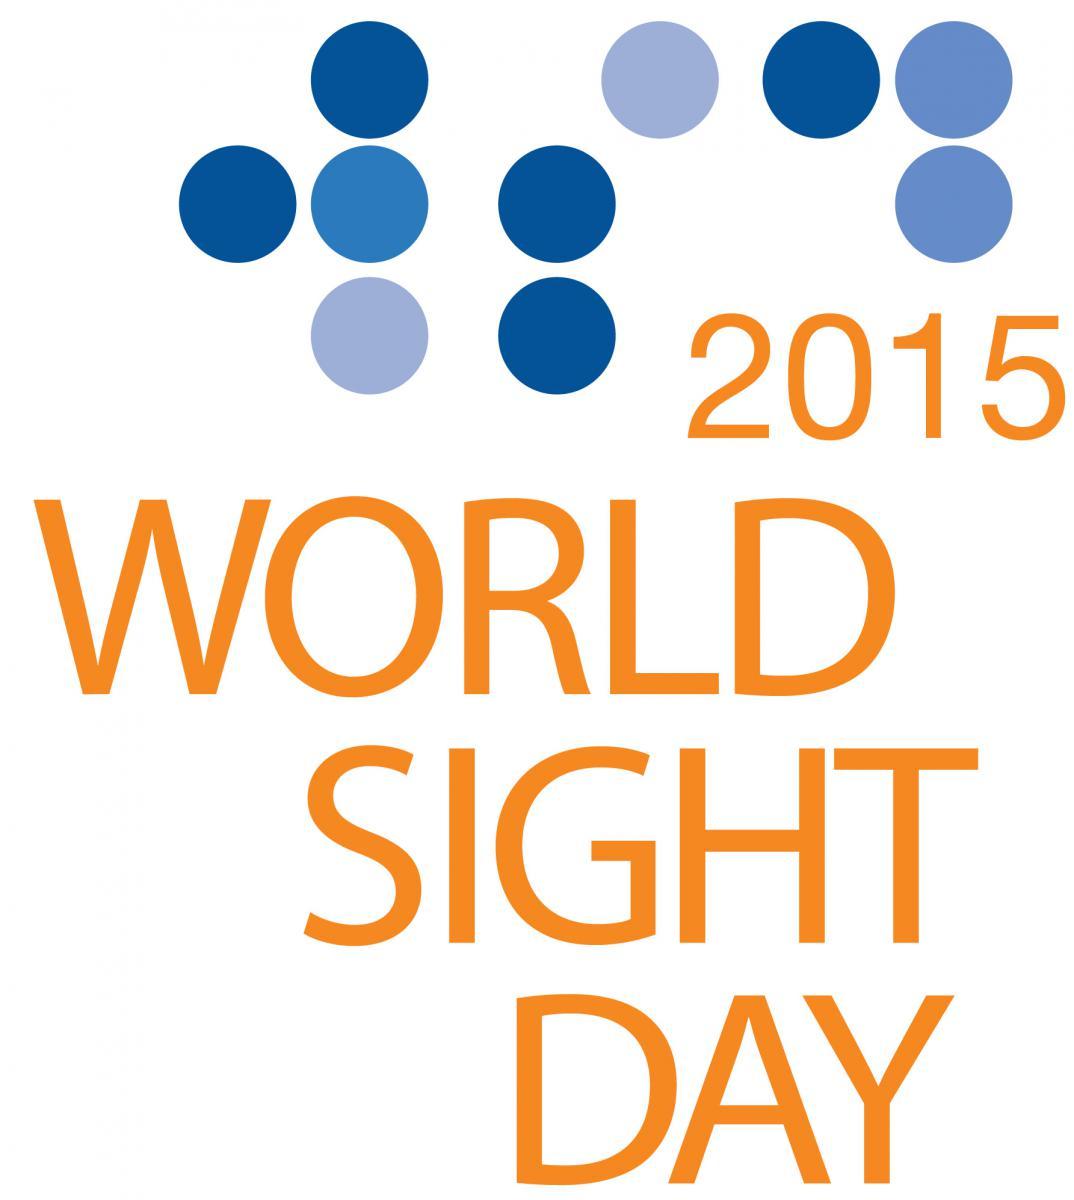 World Sight Day 2015 logo